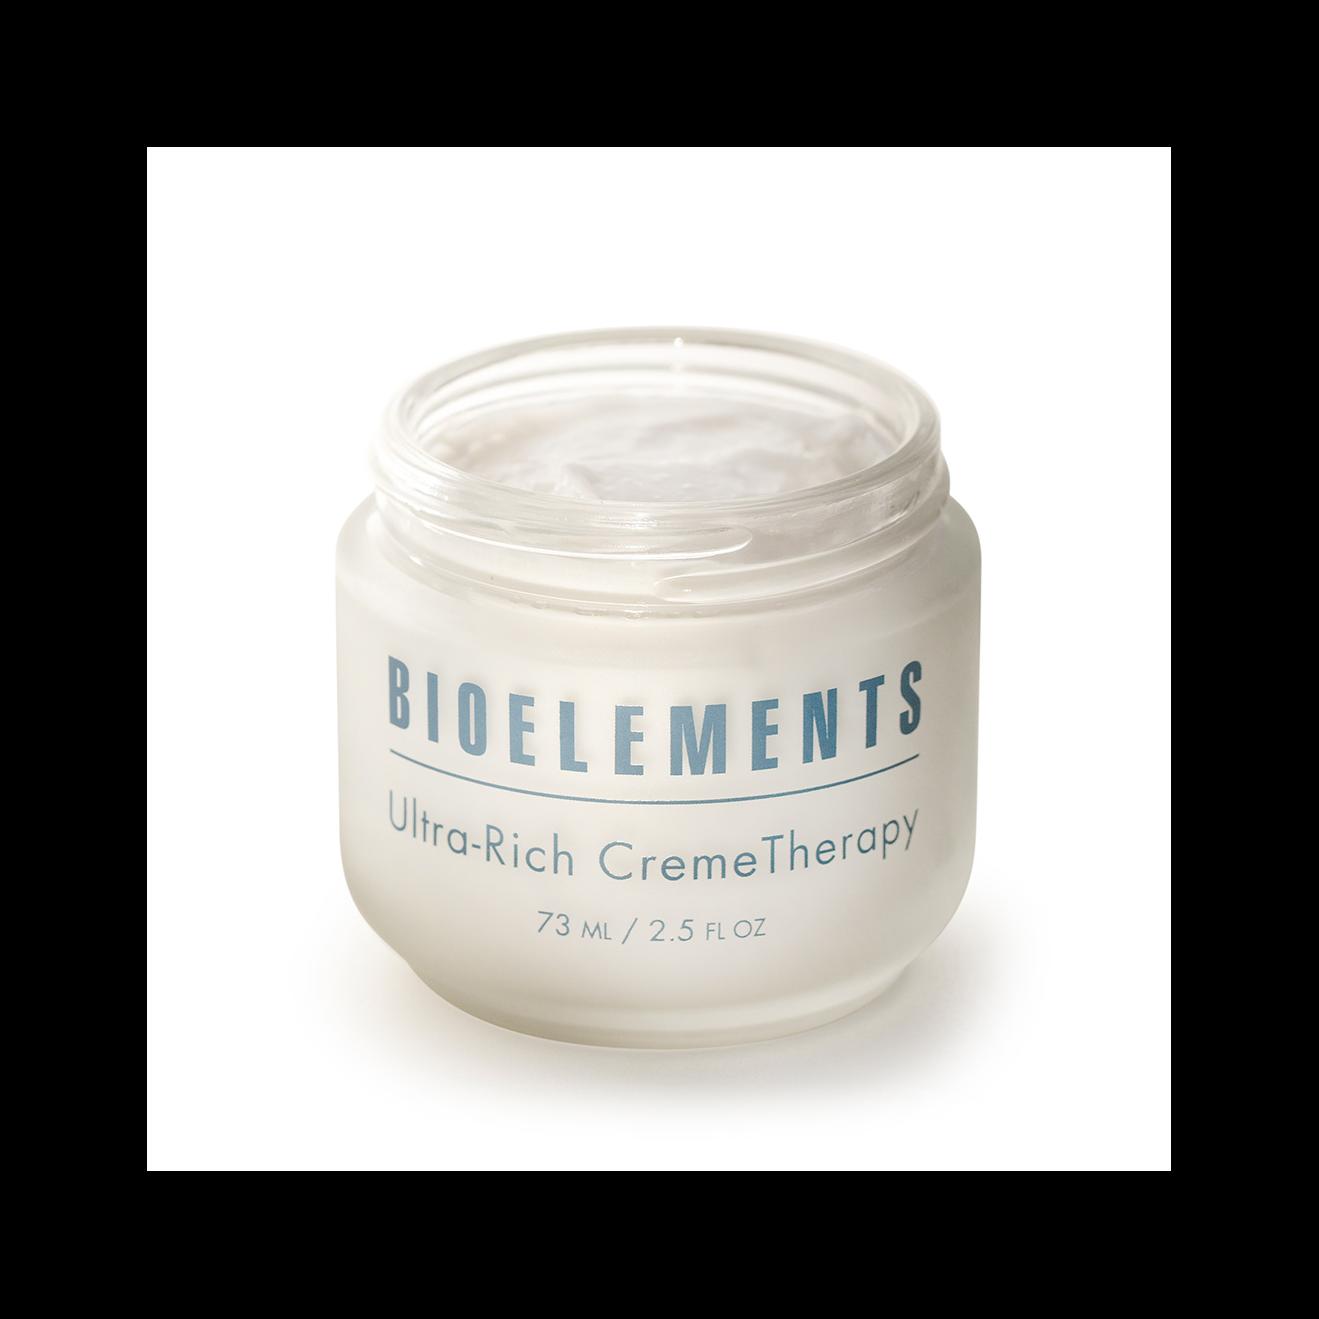 Bioelements Ultra-Rich CremeTherapy Facial Mask